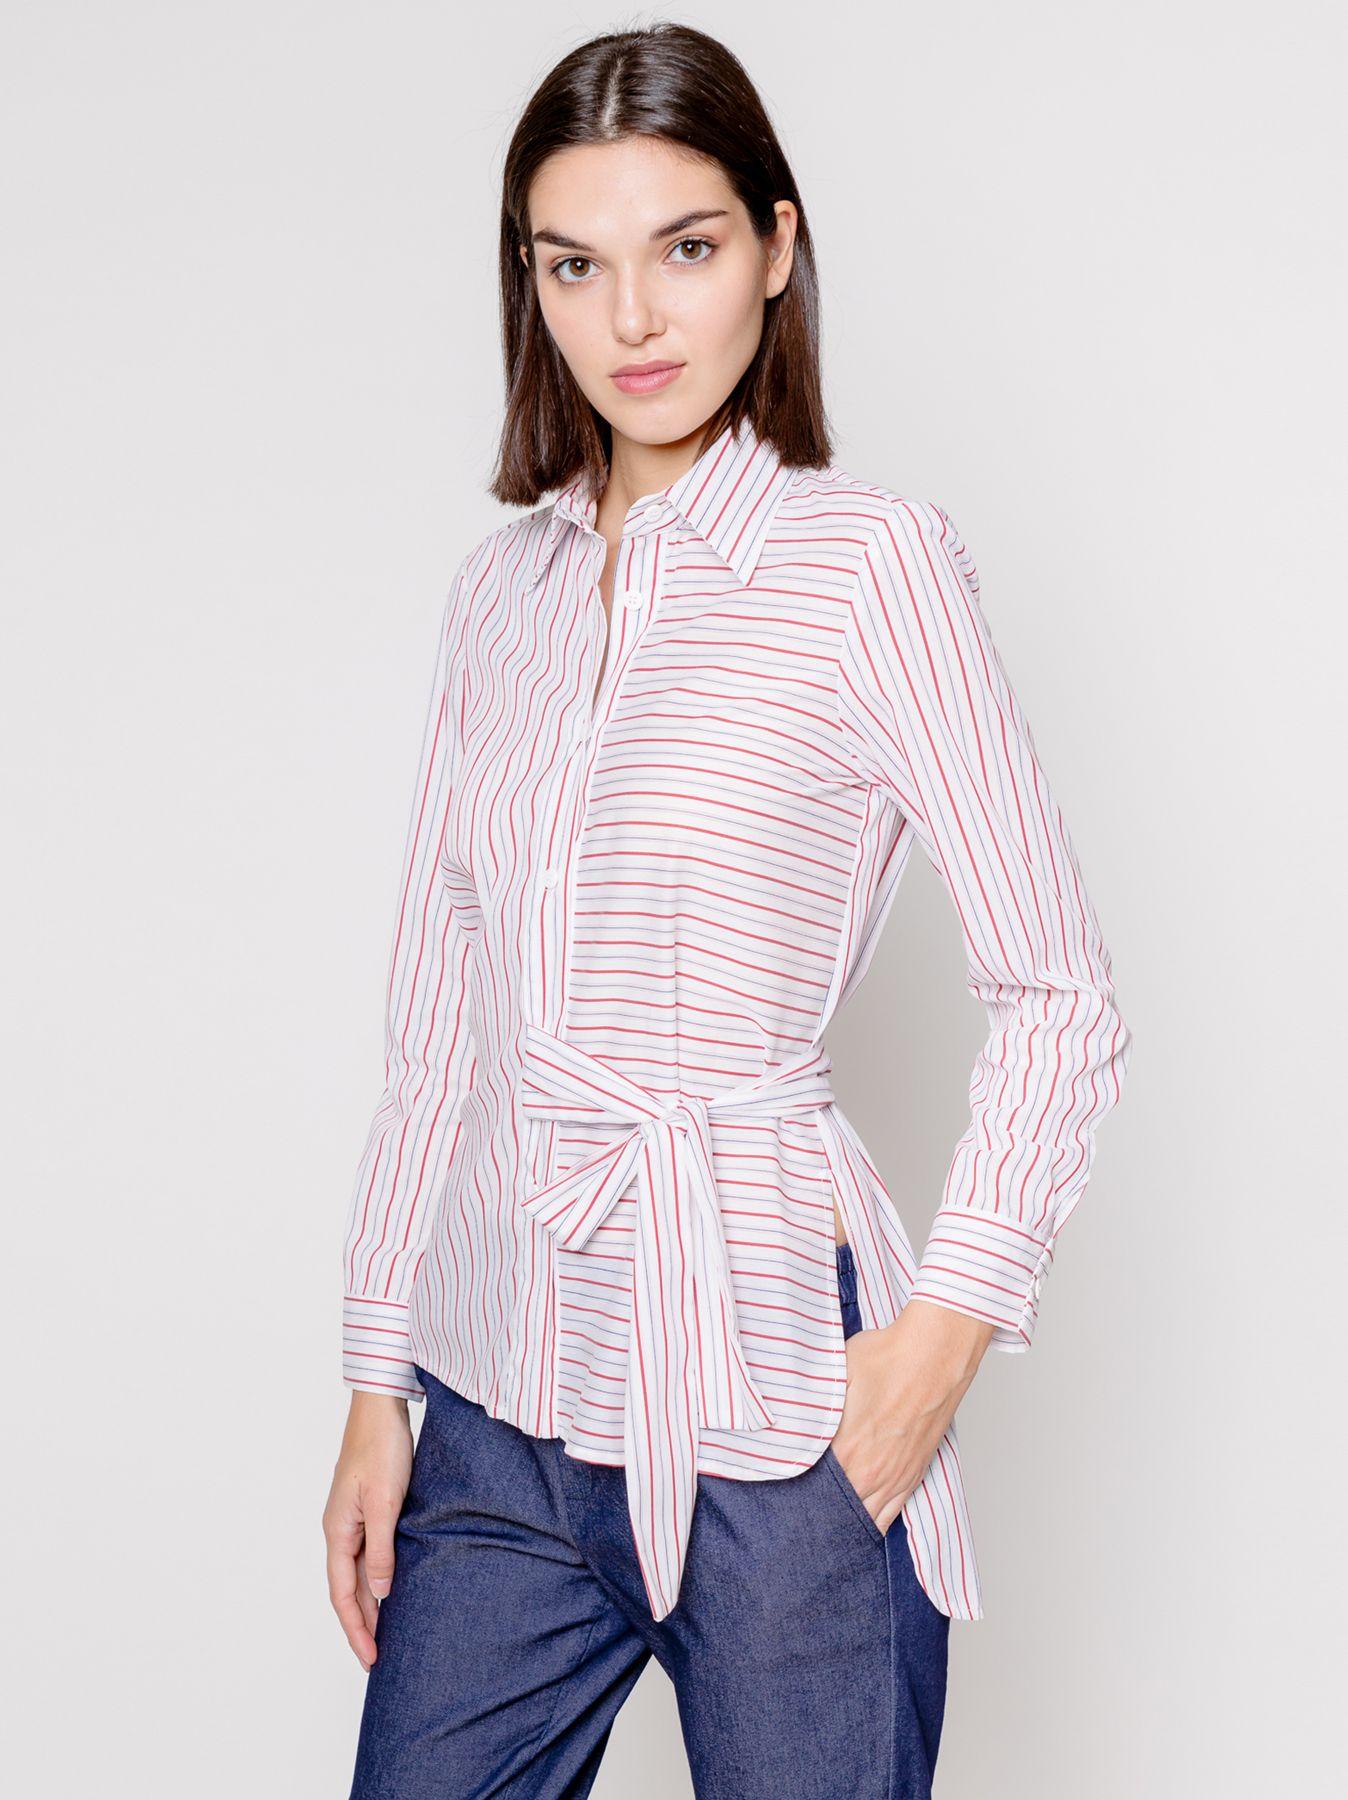 Camicia righe verticali